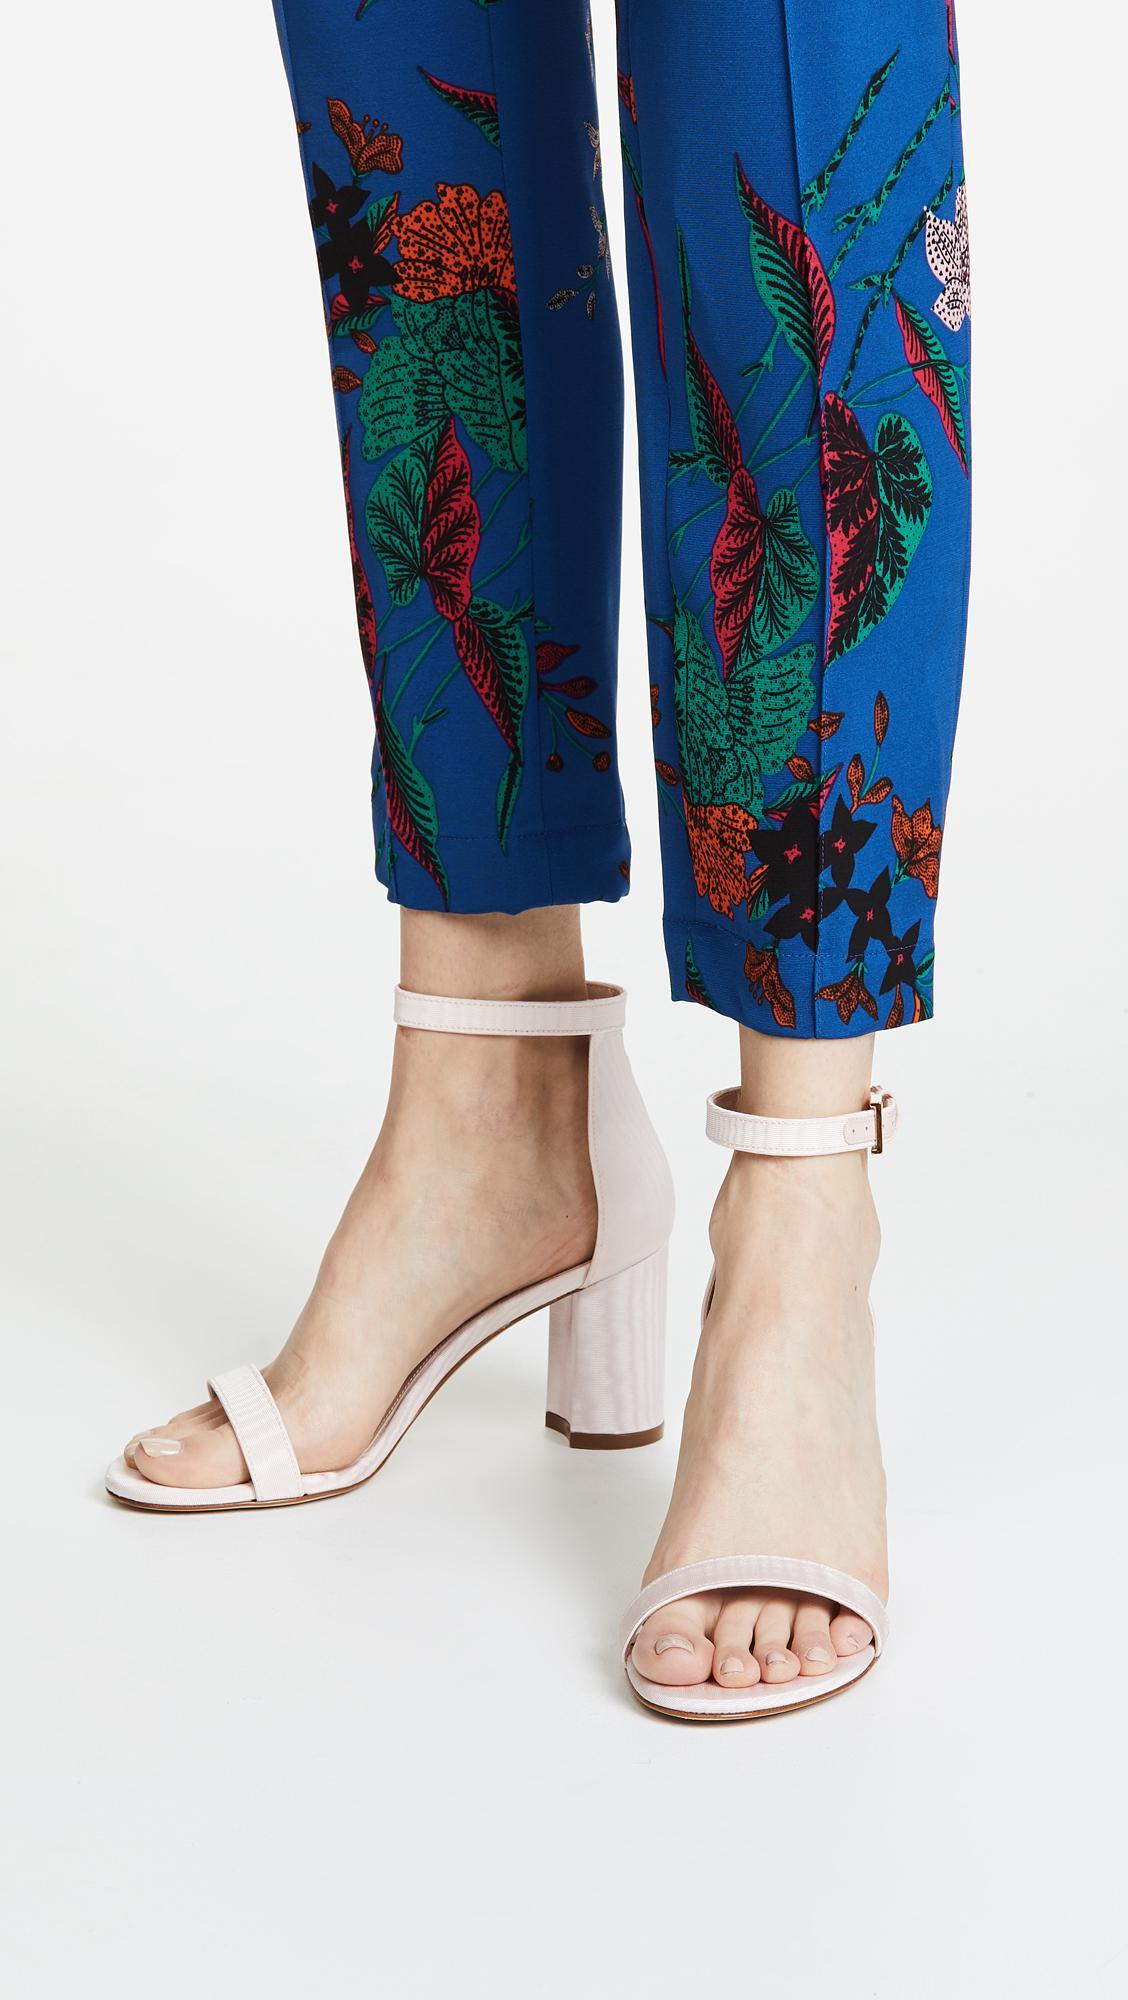 Stuart Weitzman Less sandals Outlet Newest Geniue Stockist For Sale Hot Sale Sale Online IscyC3